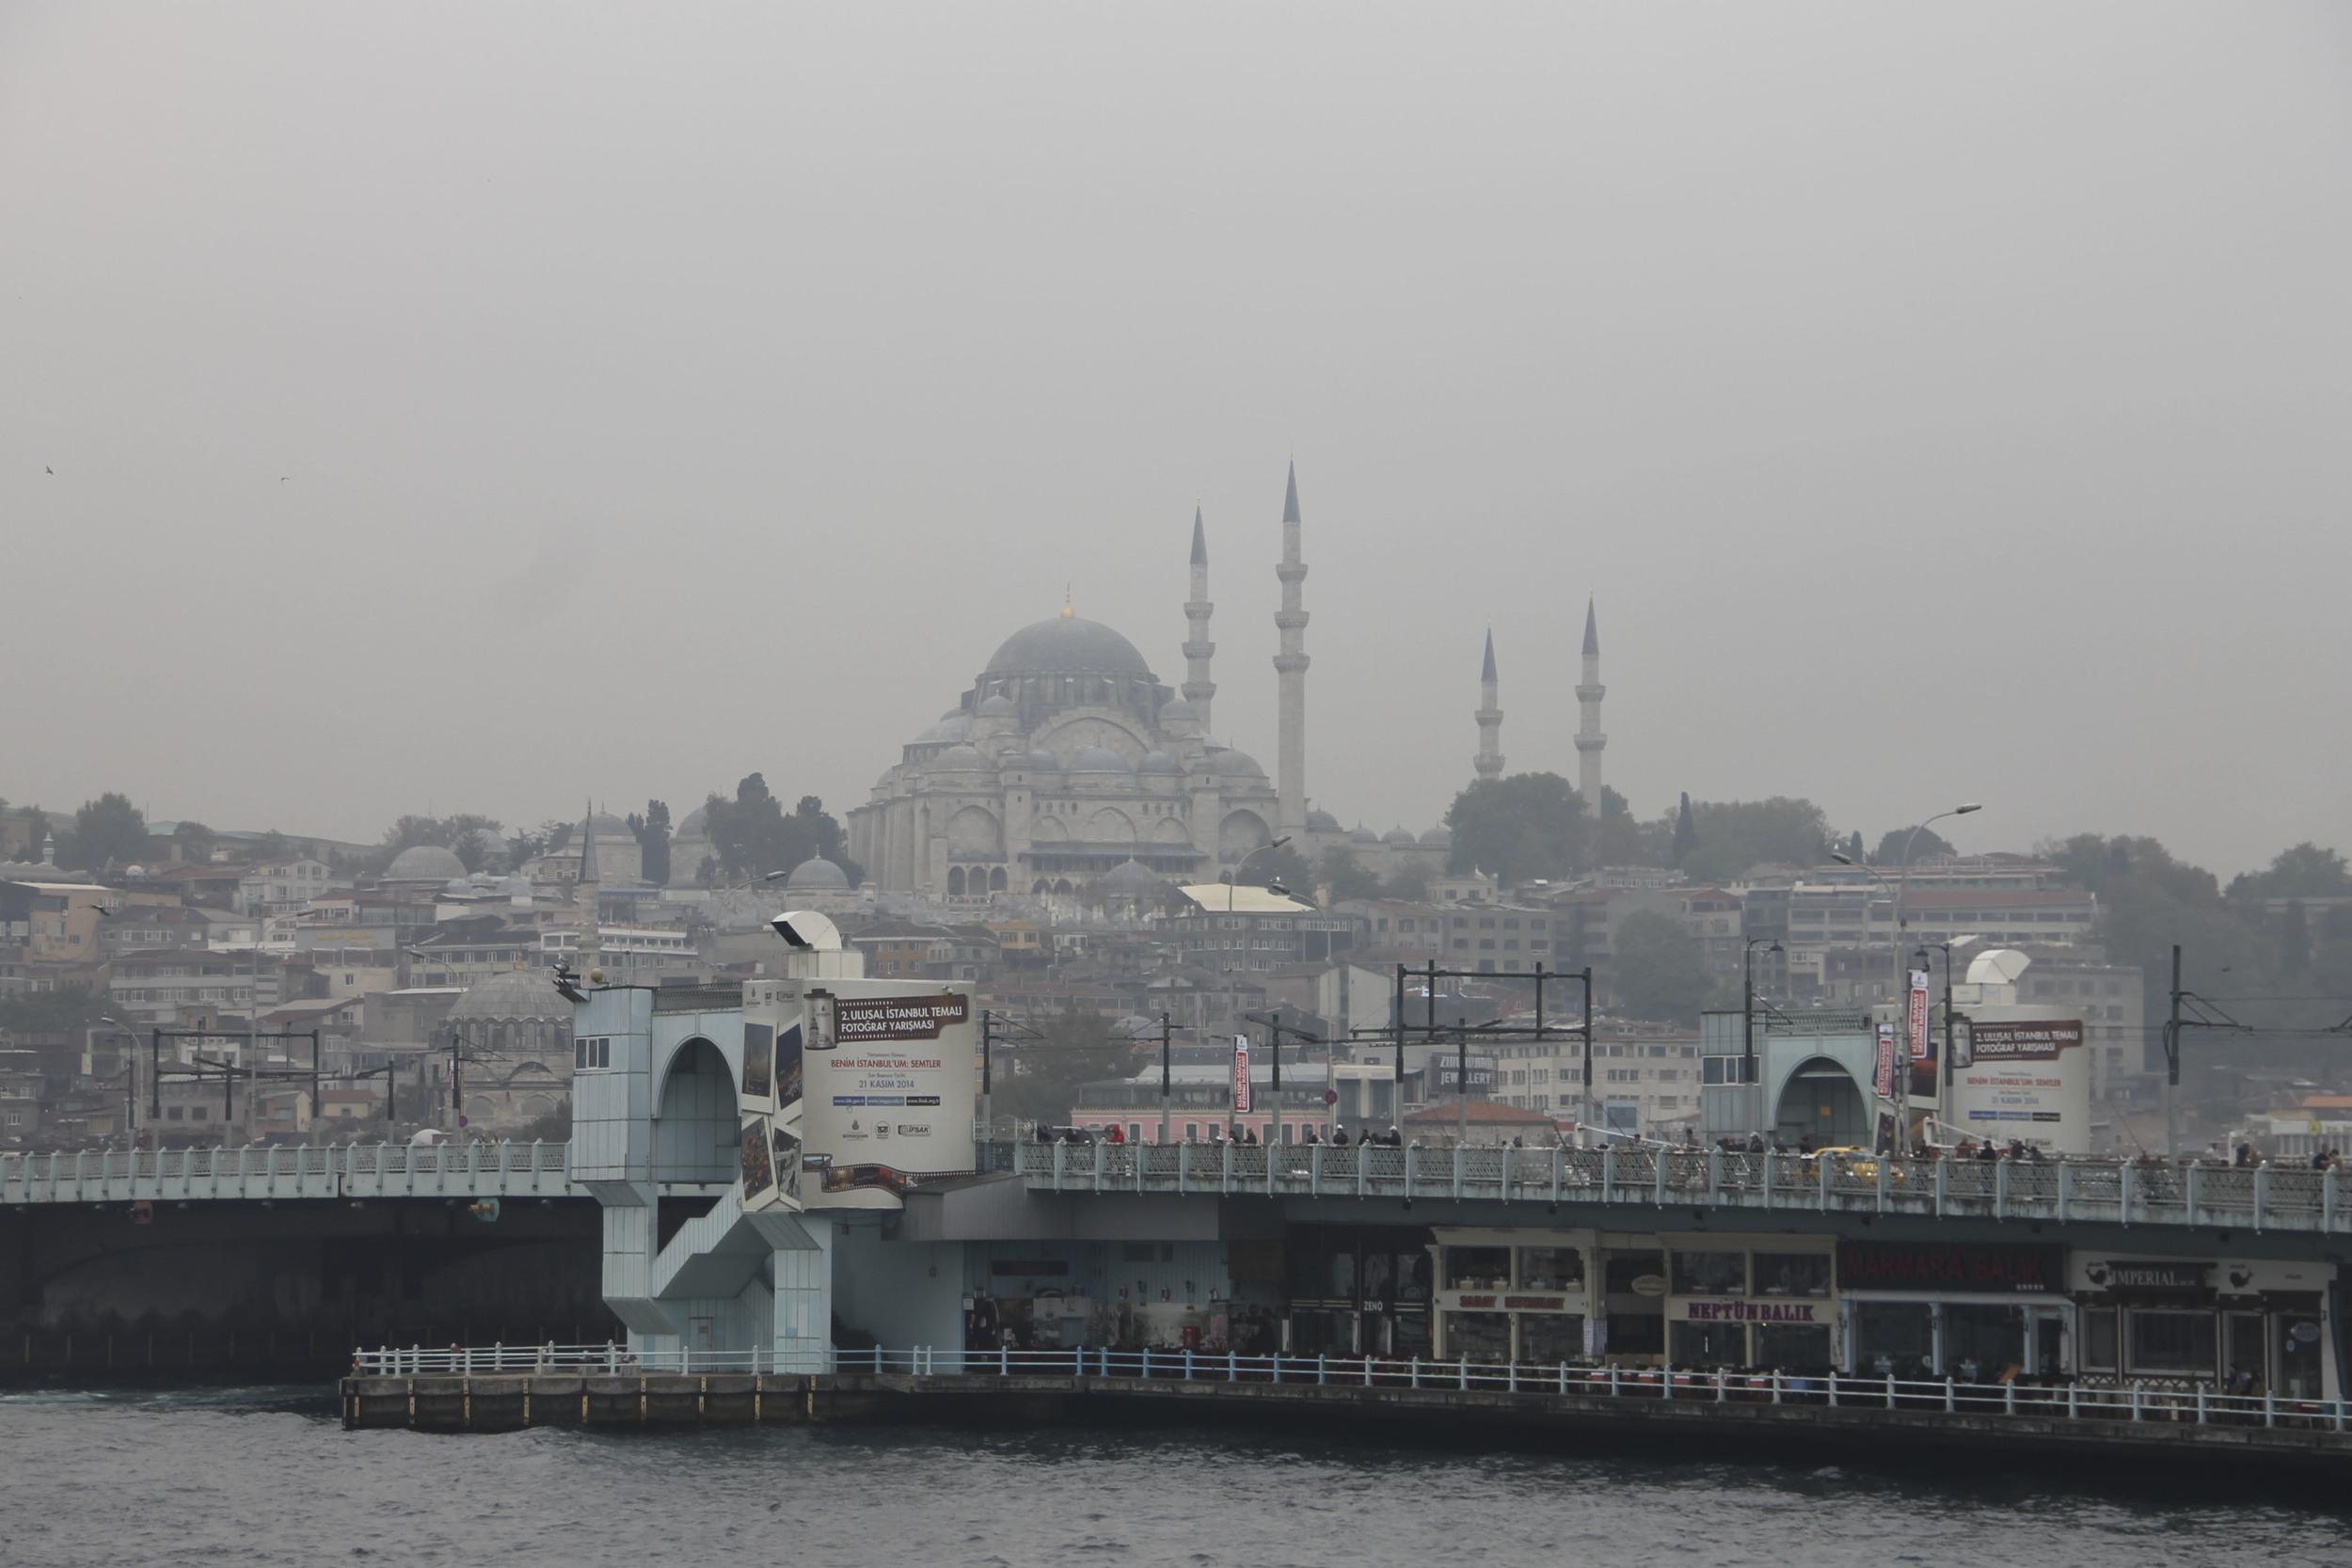 Istanbul, ygatonic on tour, Turkey yoga in istanbul2220.jpg